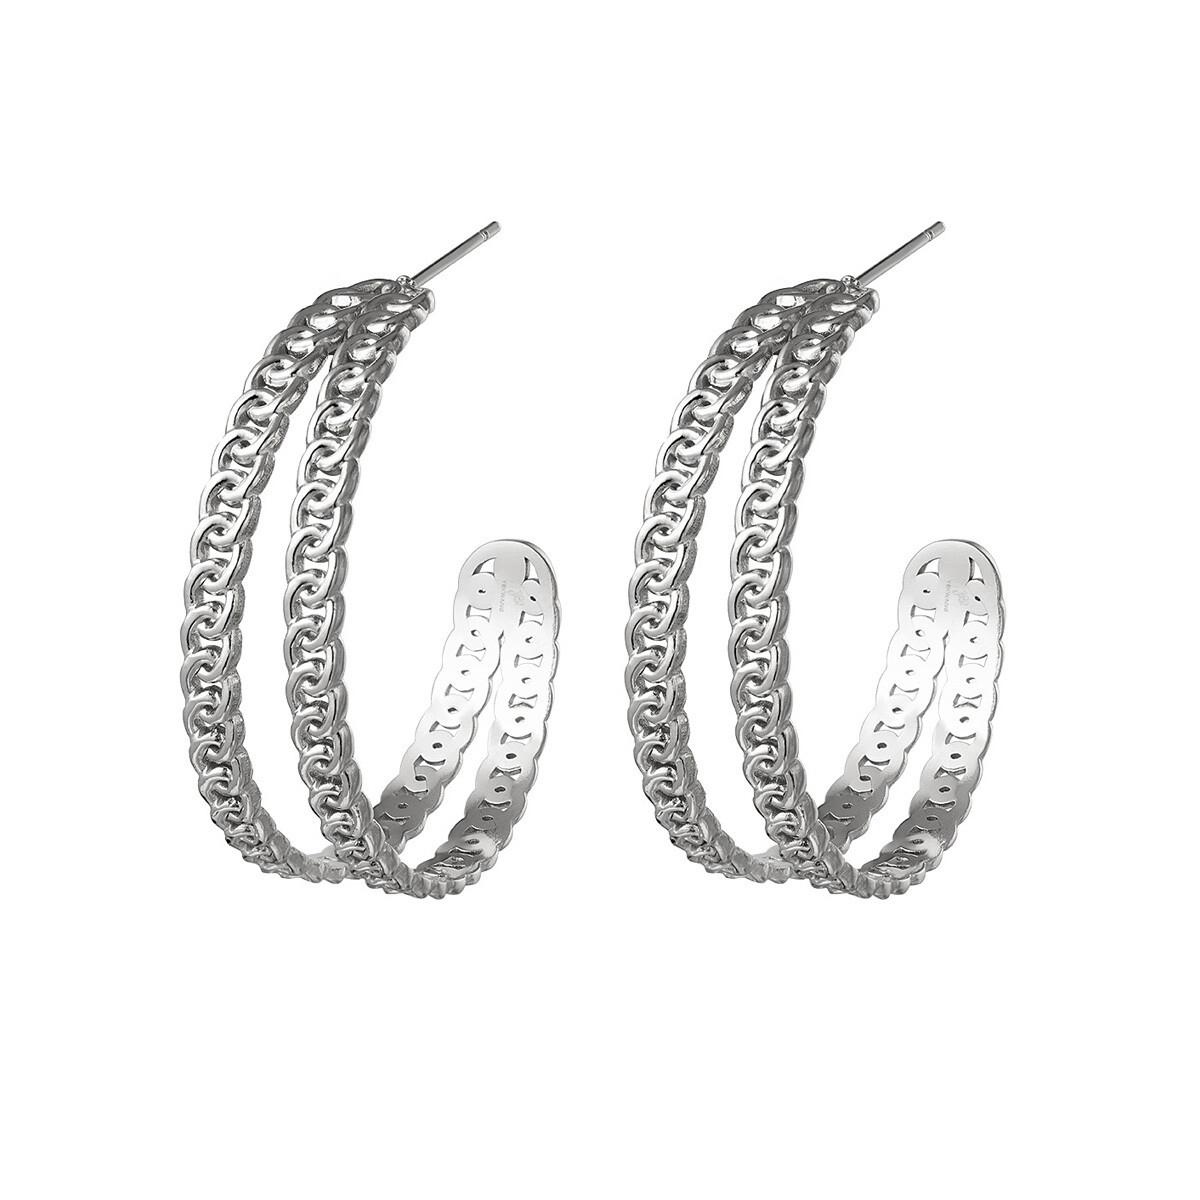 Knoopjes oorringetjes zilver 28 mm stainless steel